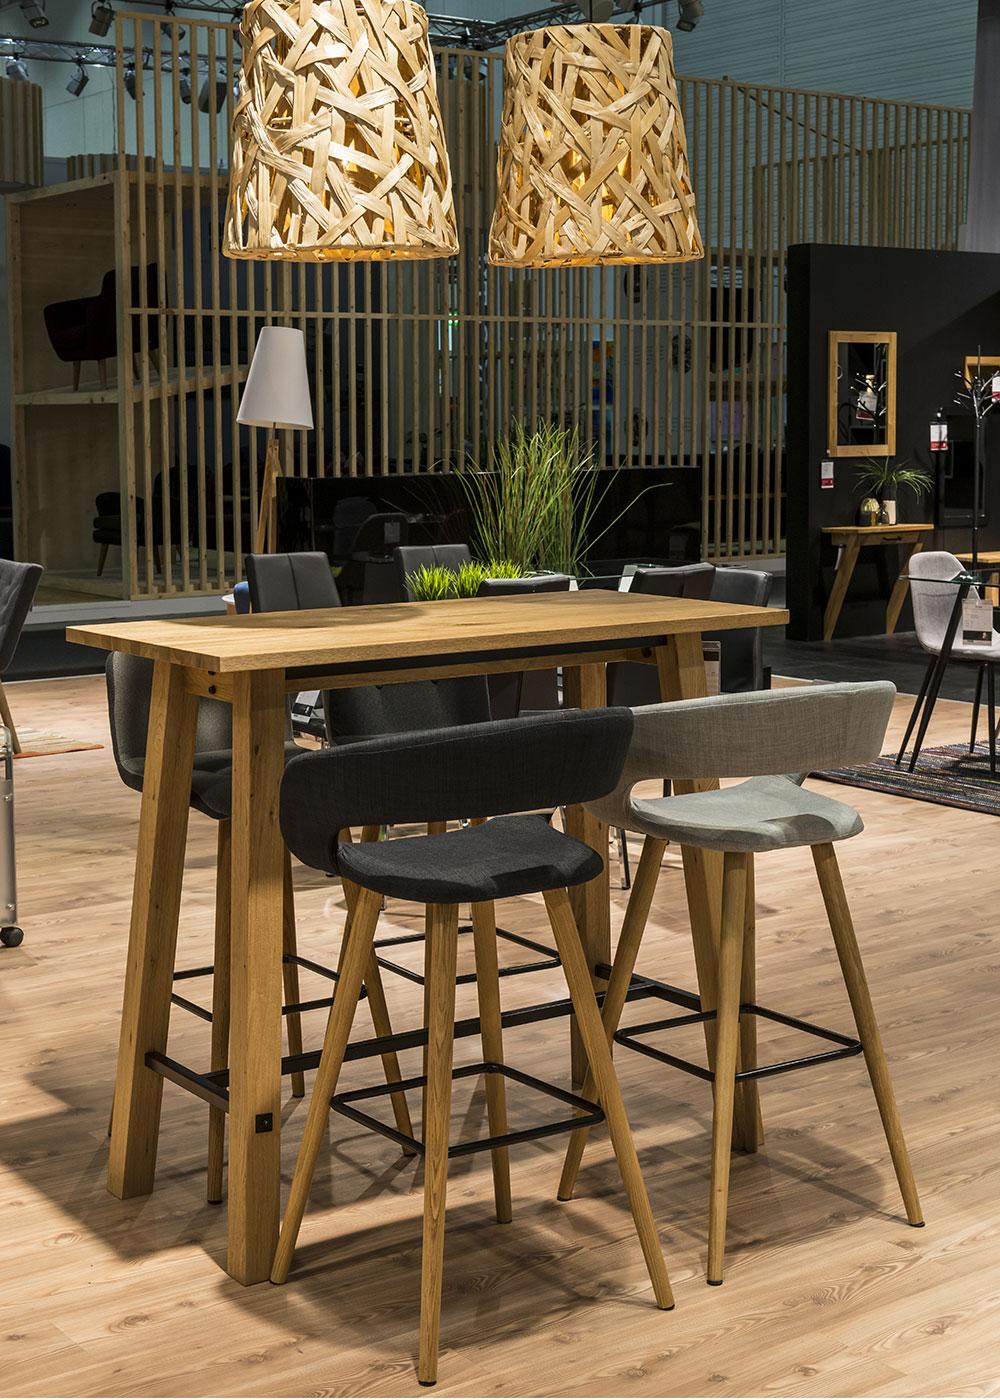 Barový stůl Kiruna, 120 cm